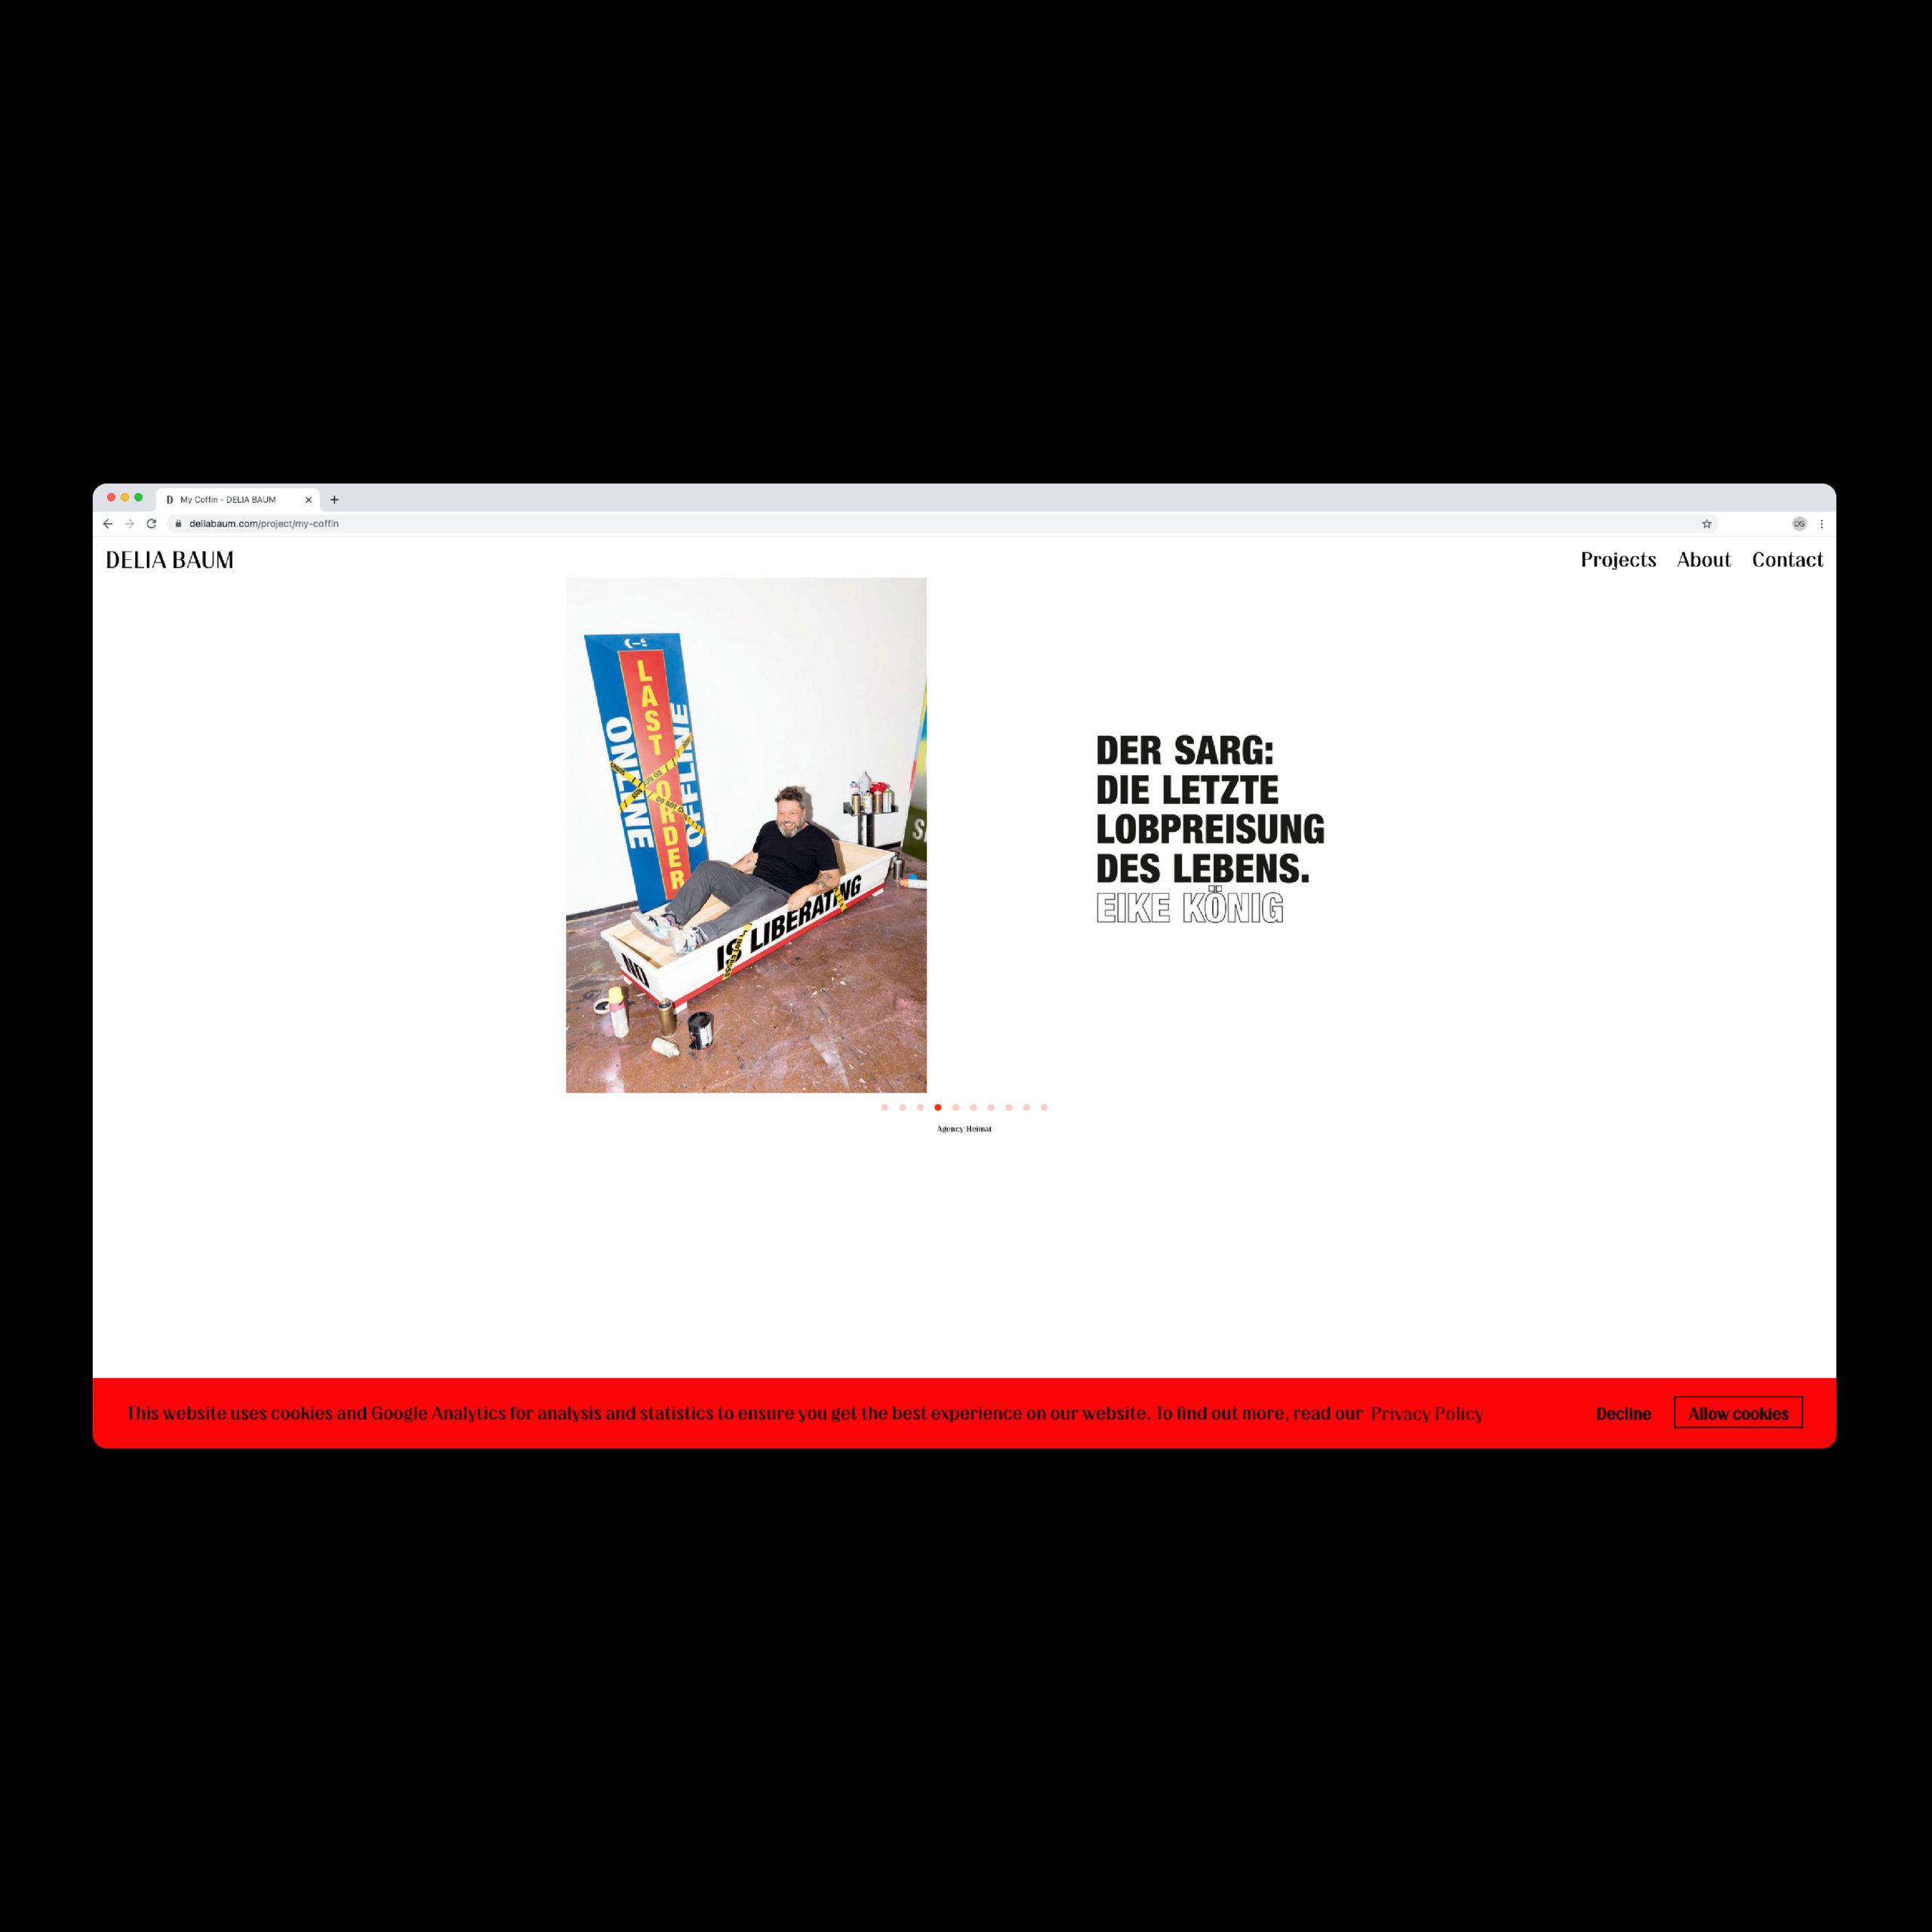 04_Delia-Baum_CI_Daniel-Stuhlpfarrer_Website_3